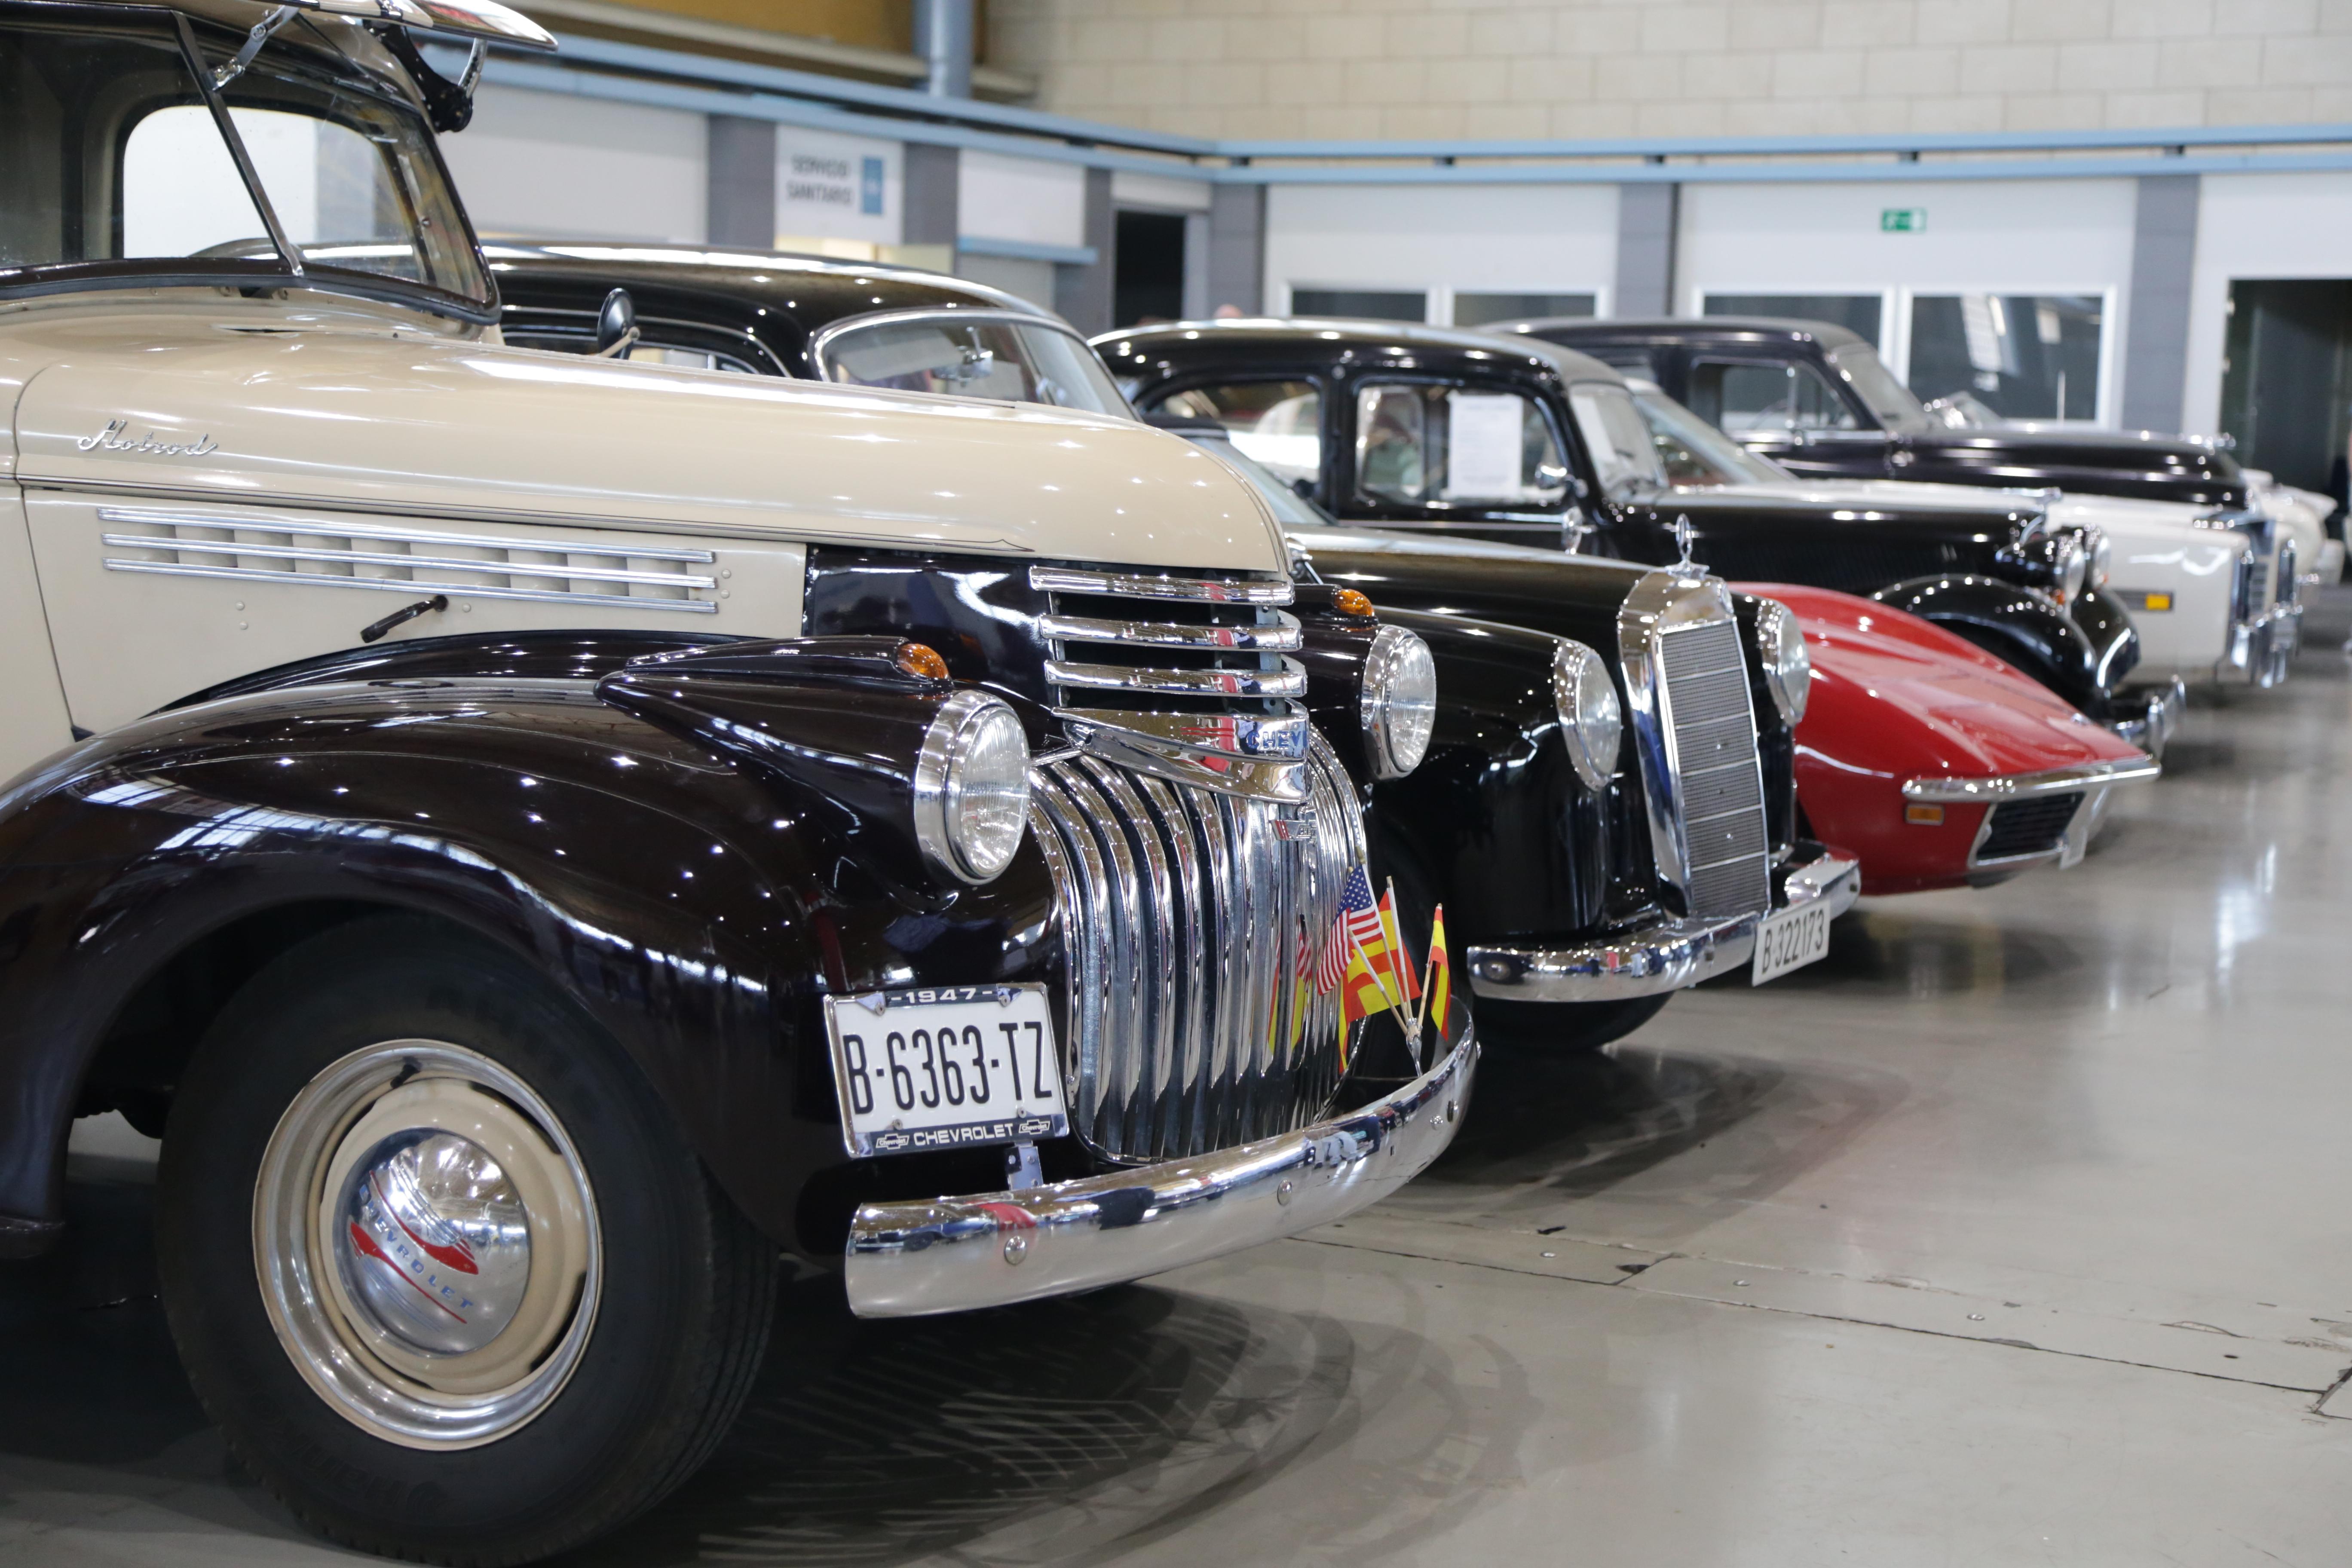 A taste of auto history at IFA Alicante for Auto Antic 2018 - The ...